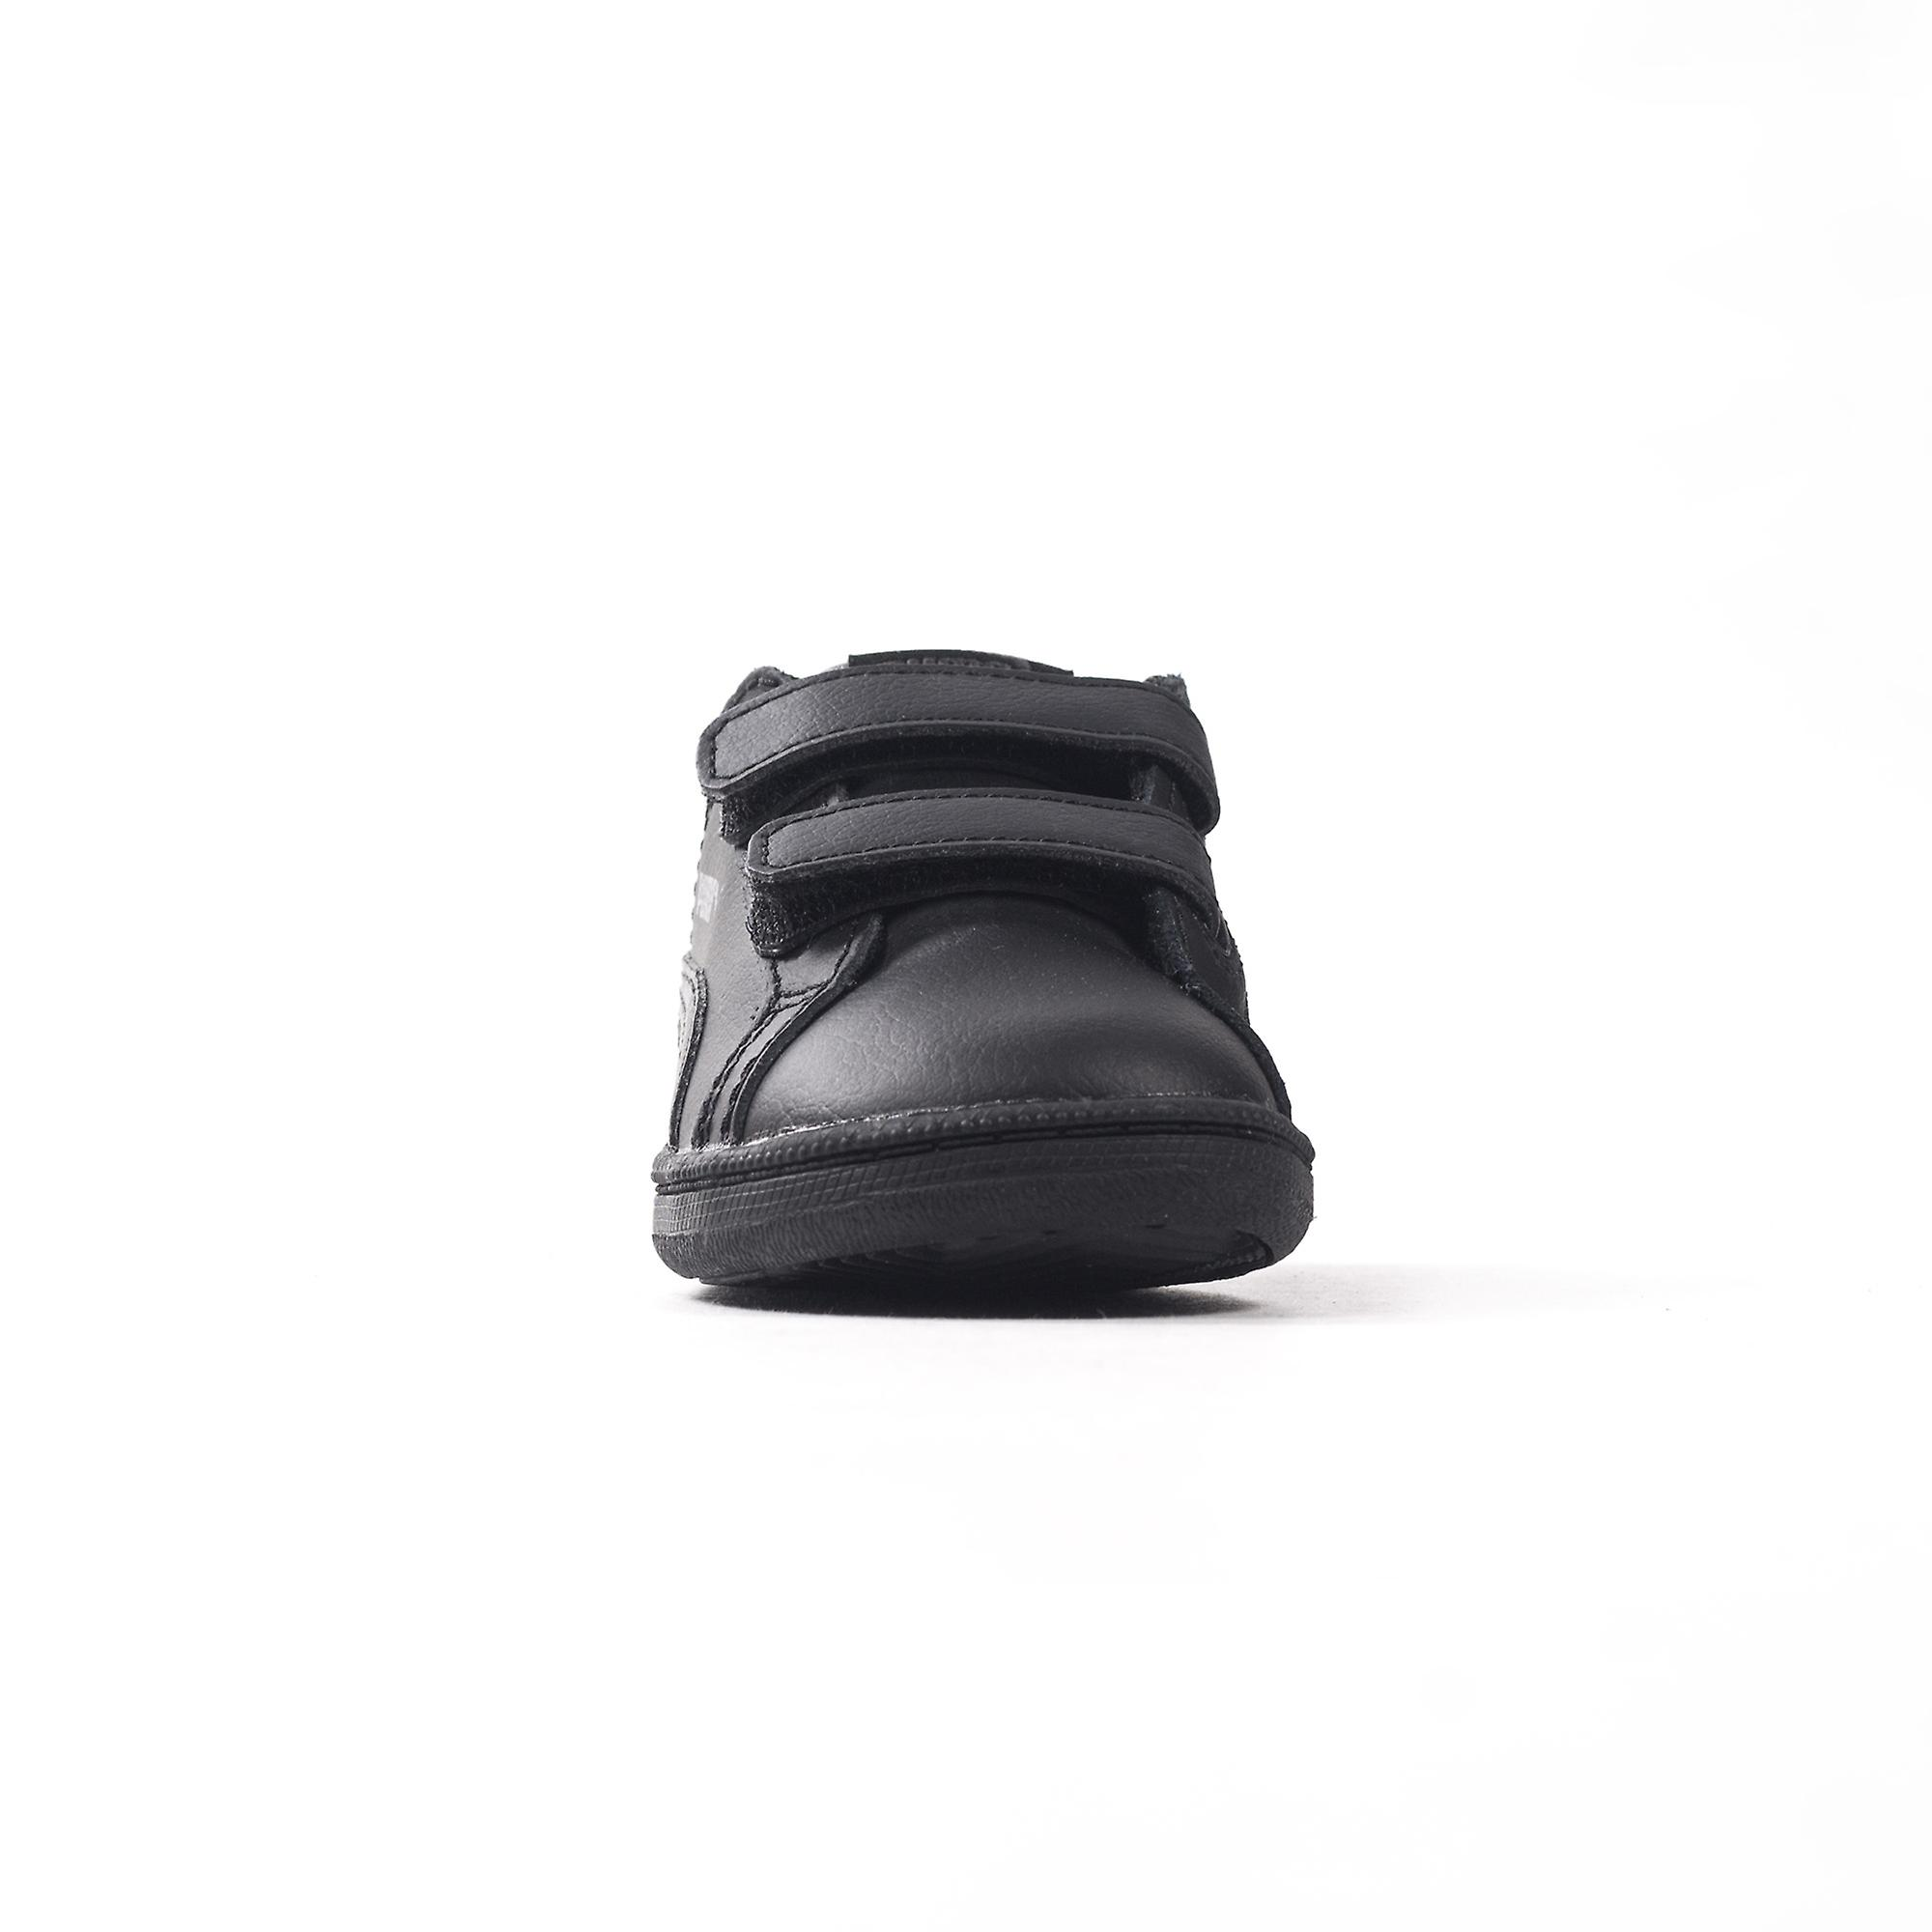 Puma Smash Fun Infant Kids Nubuck Trainer Shoe Black/Black